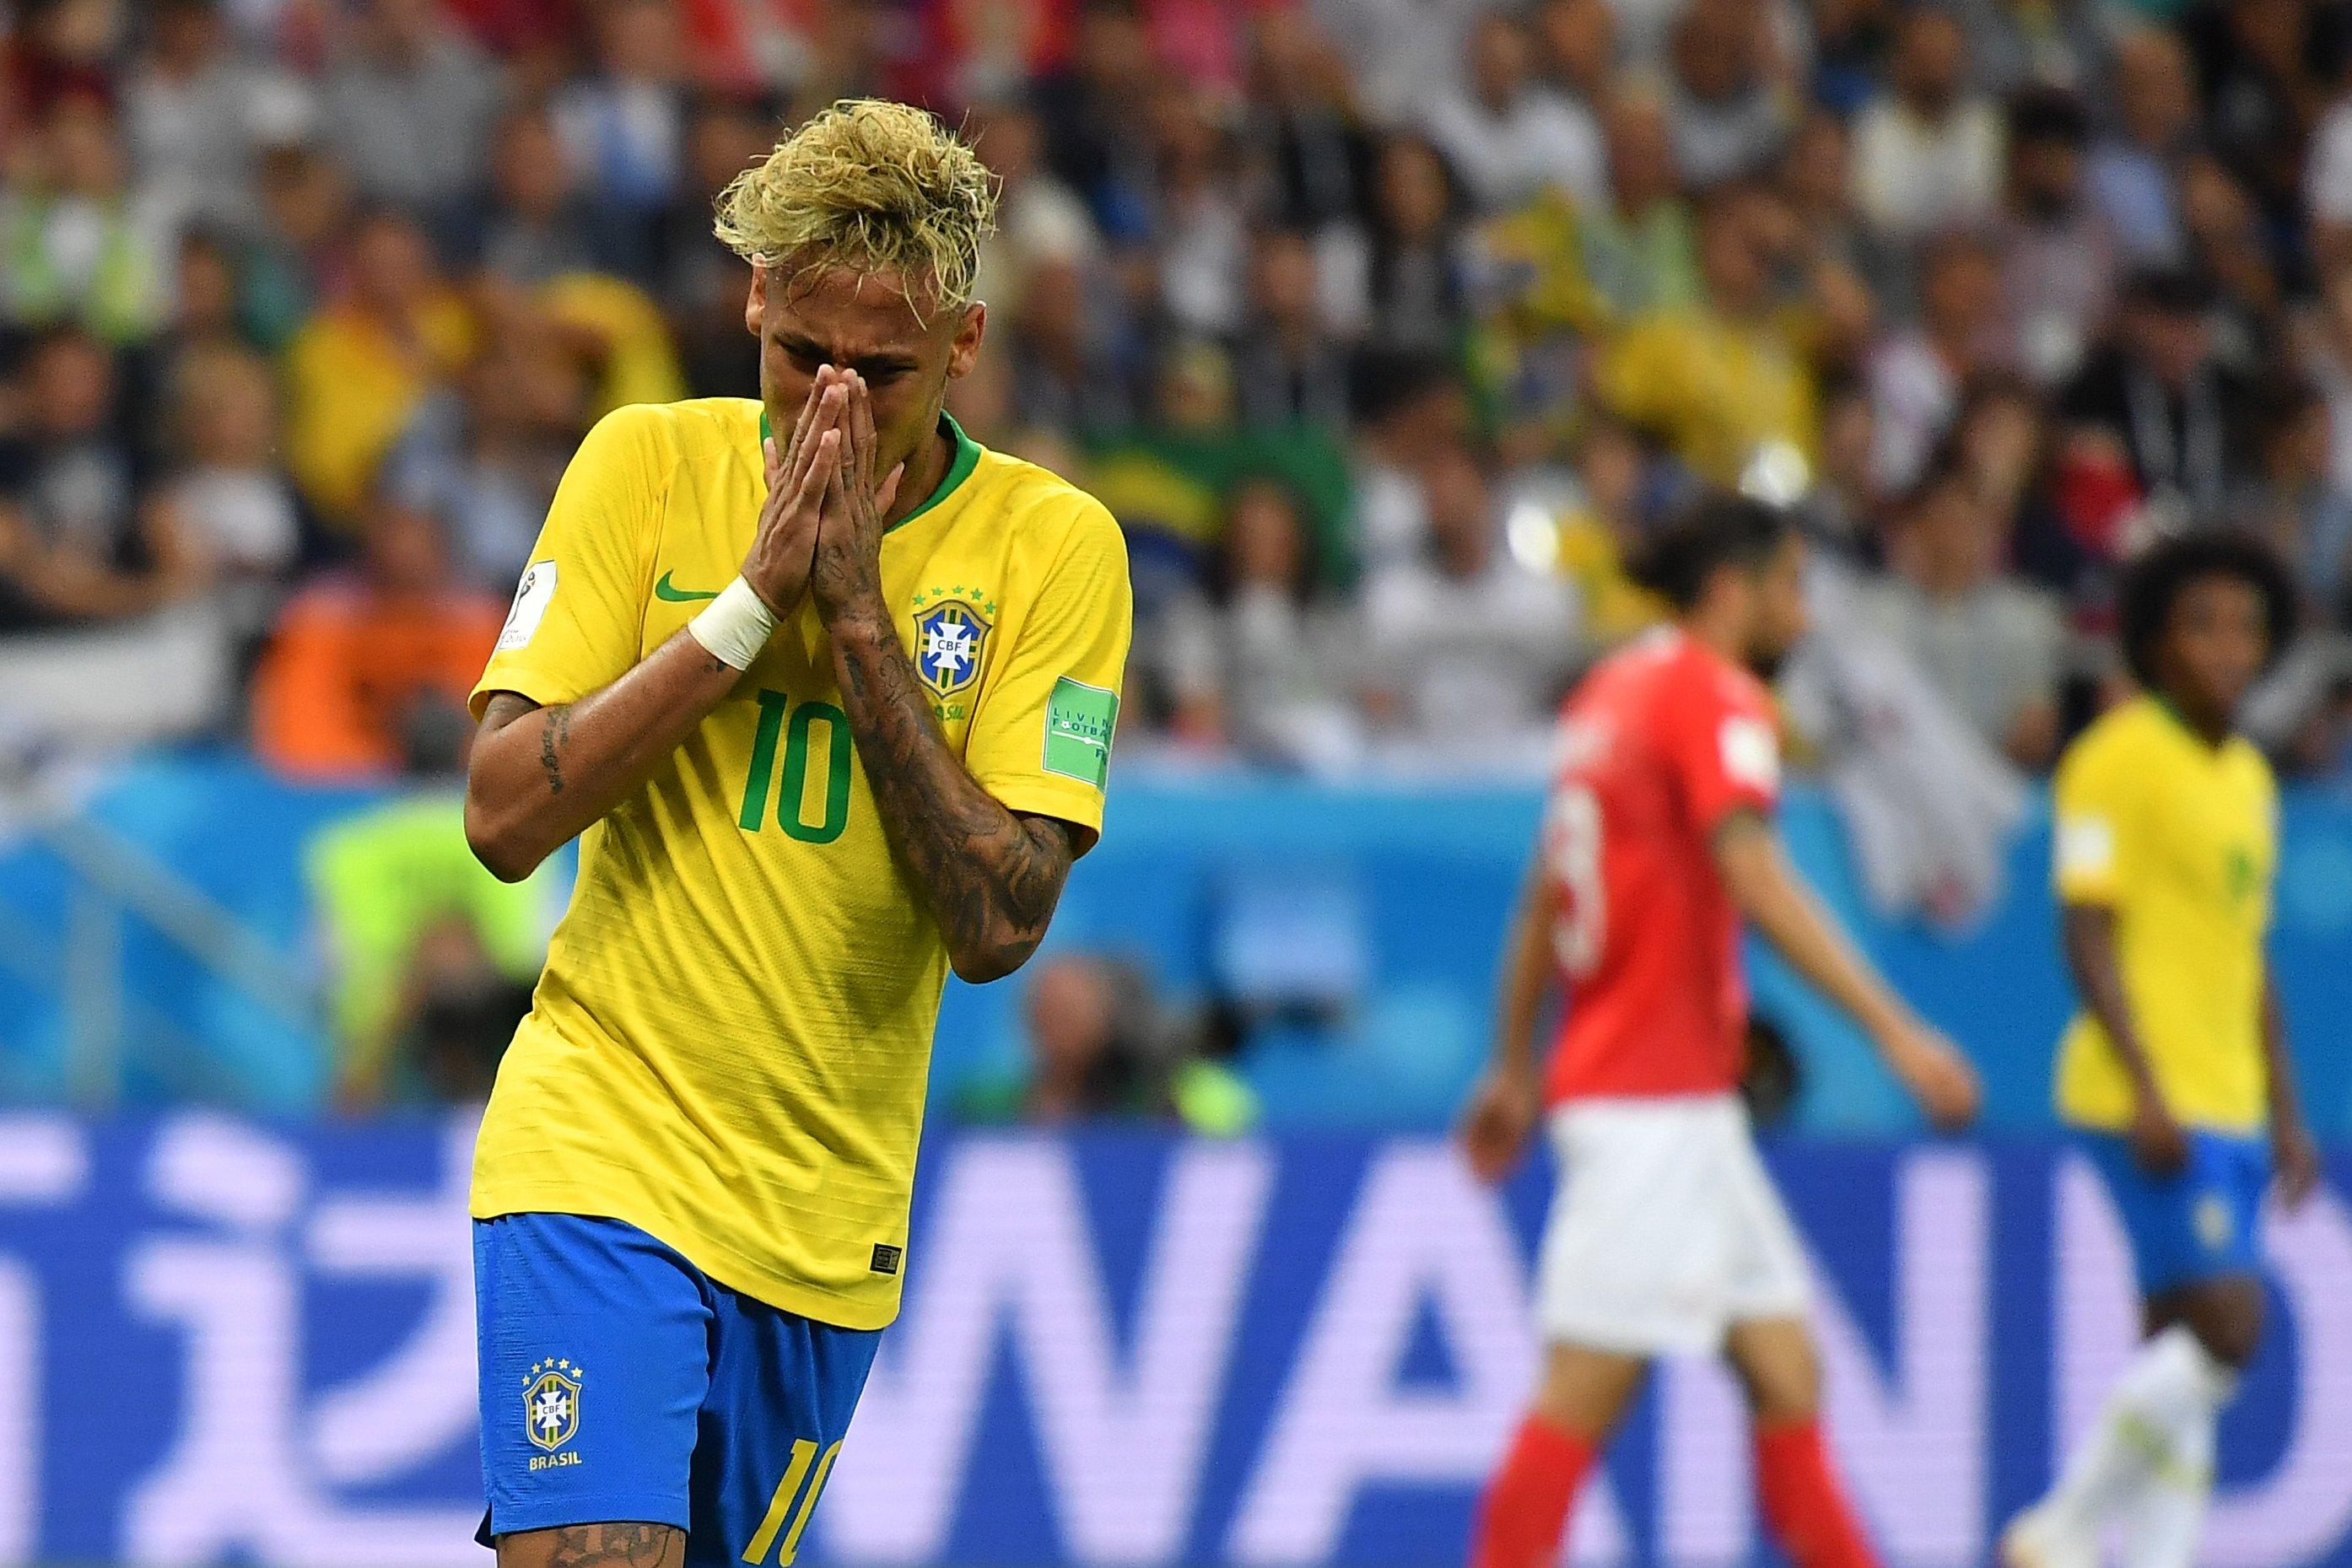 Bresil - Suisse (1-1) : un Neymar en demi-teinte